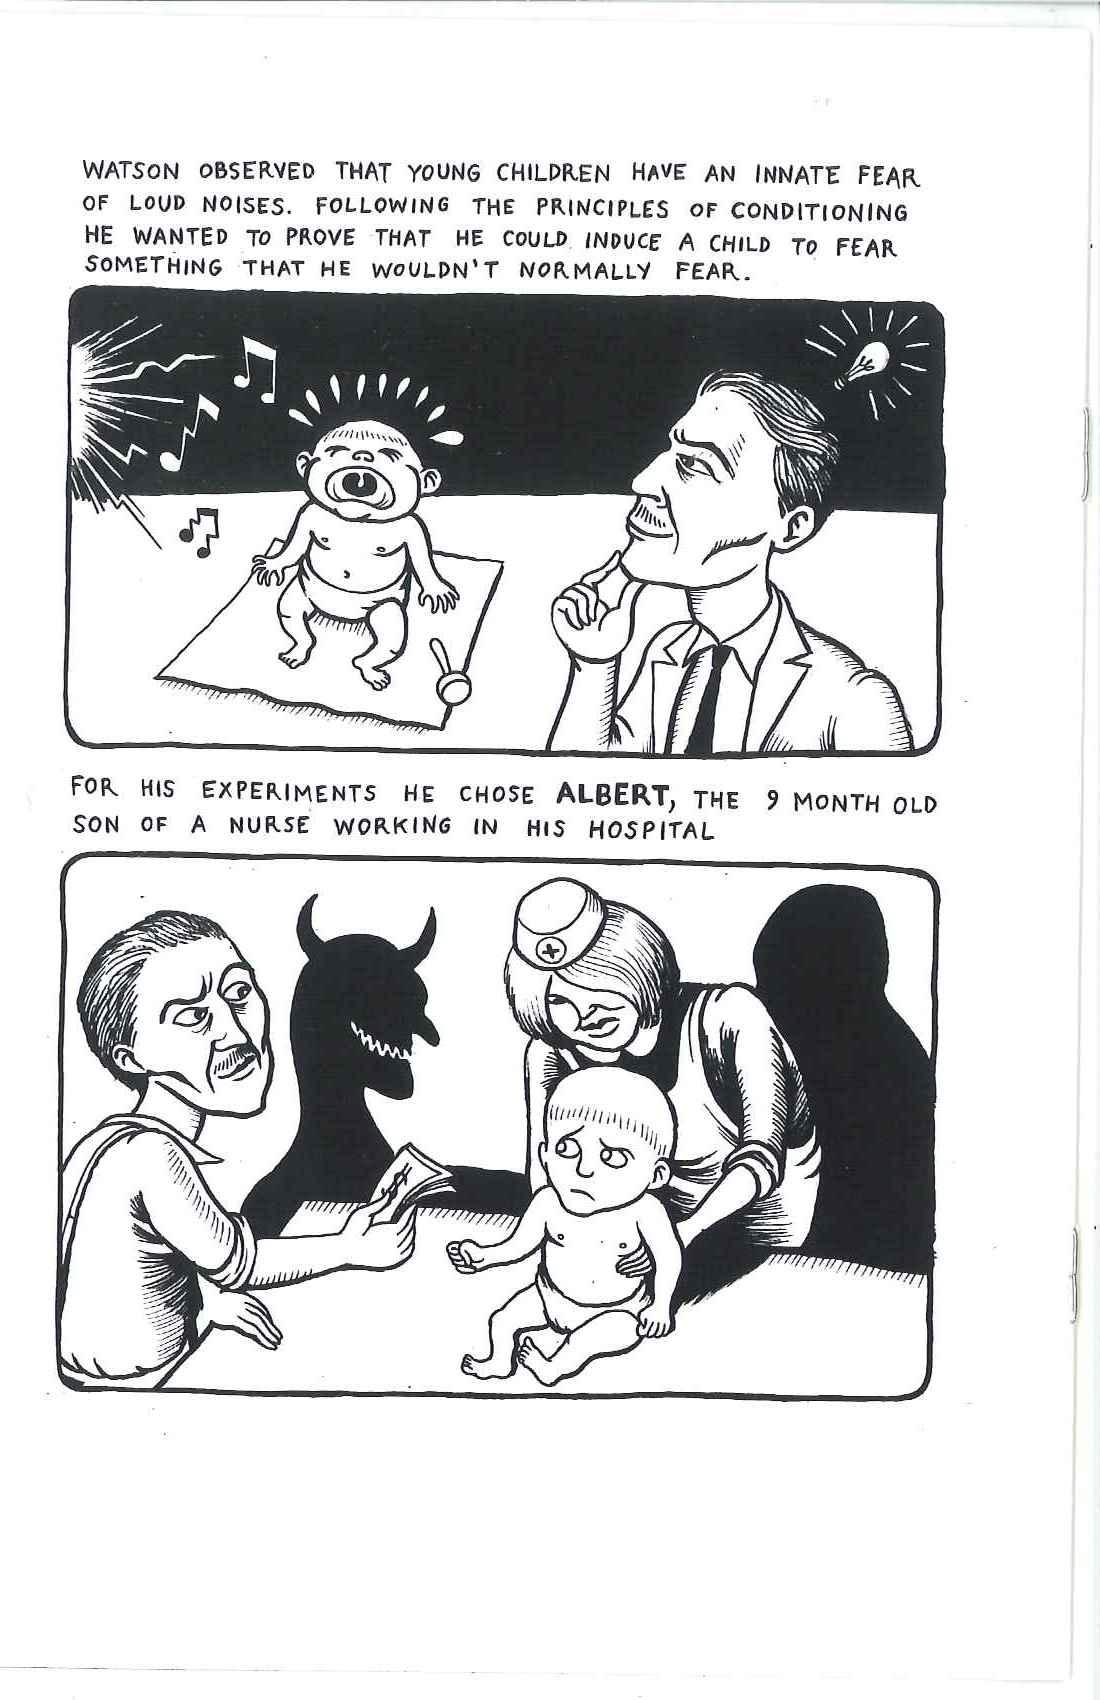 little albert John b watson (1878-1958) was an american psychologist that founded the school of behaviorism watson was not interested in.